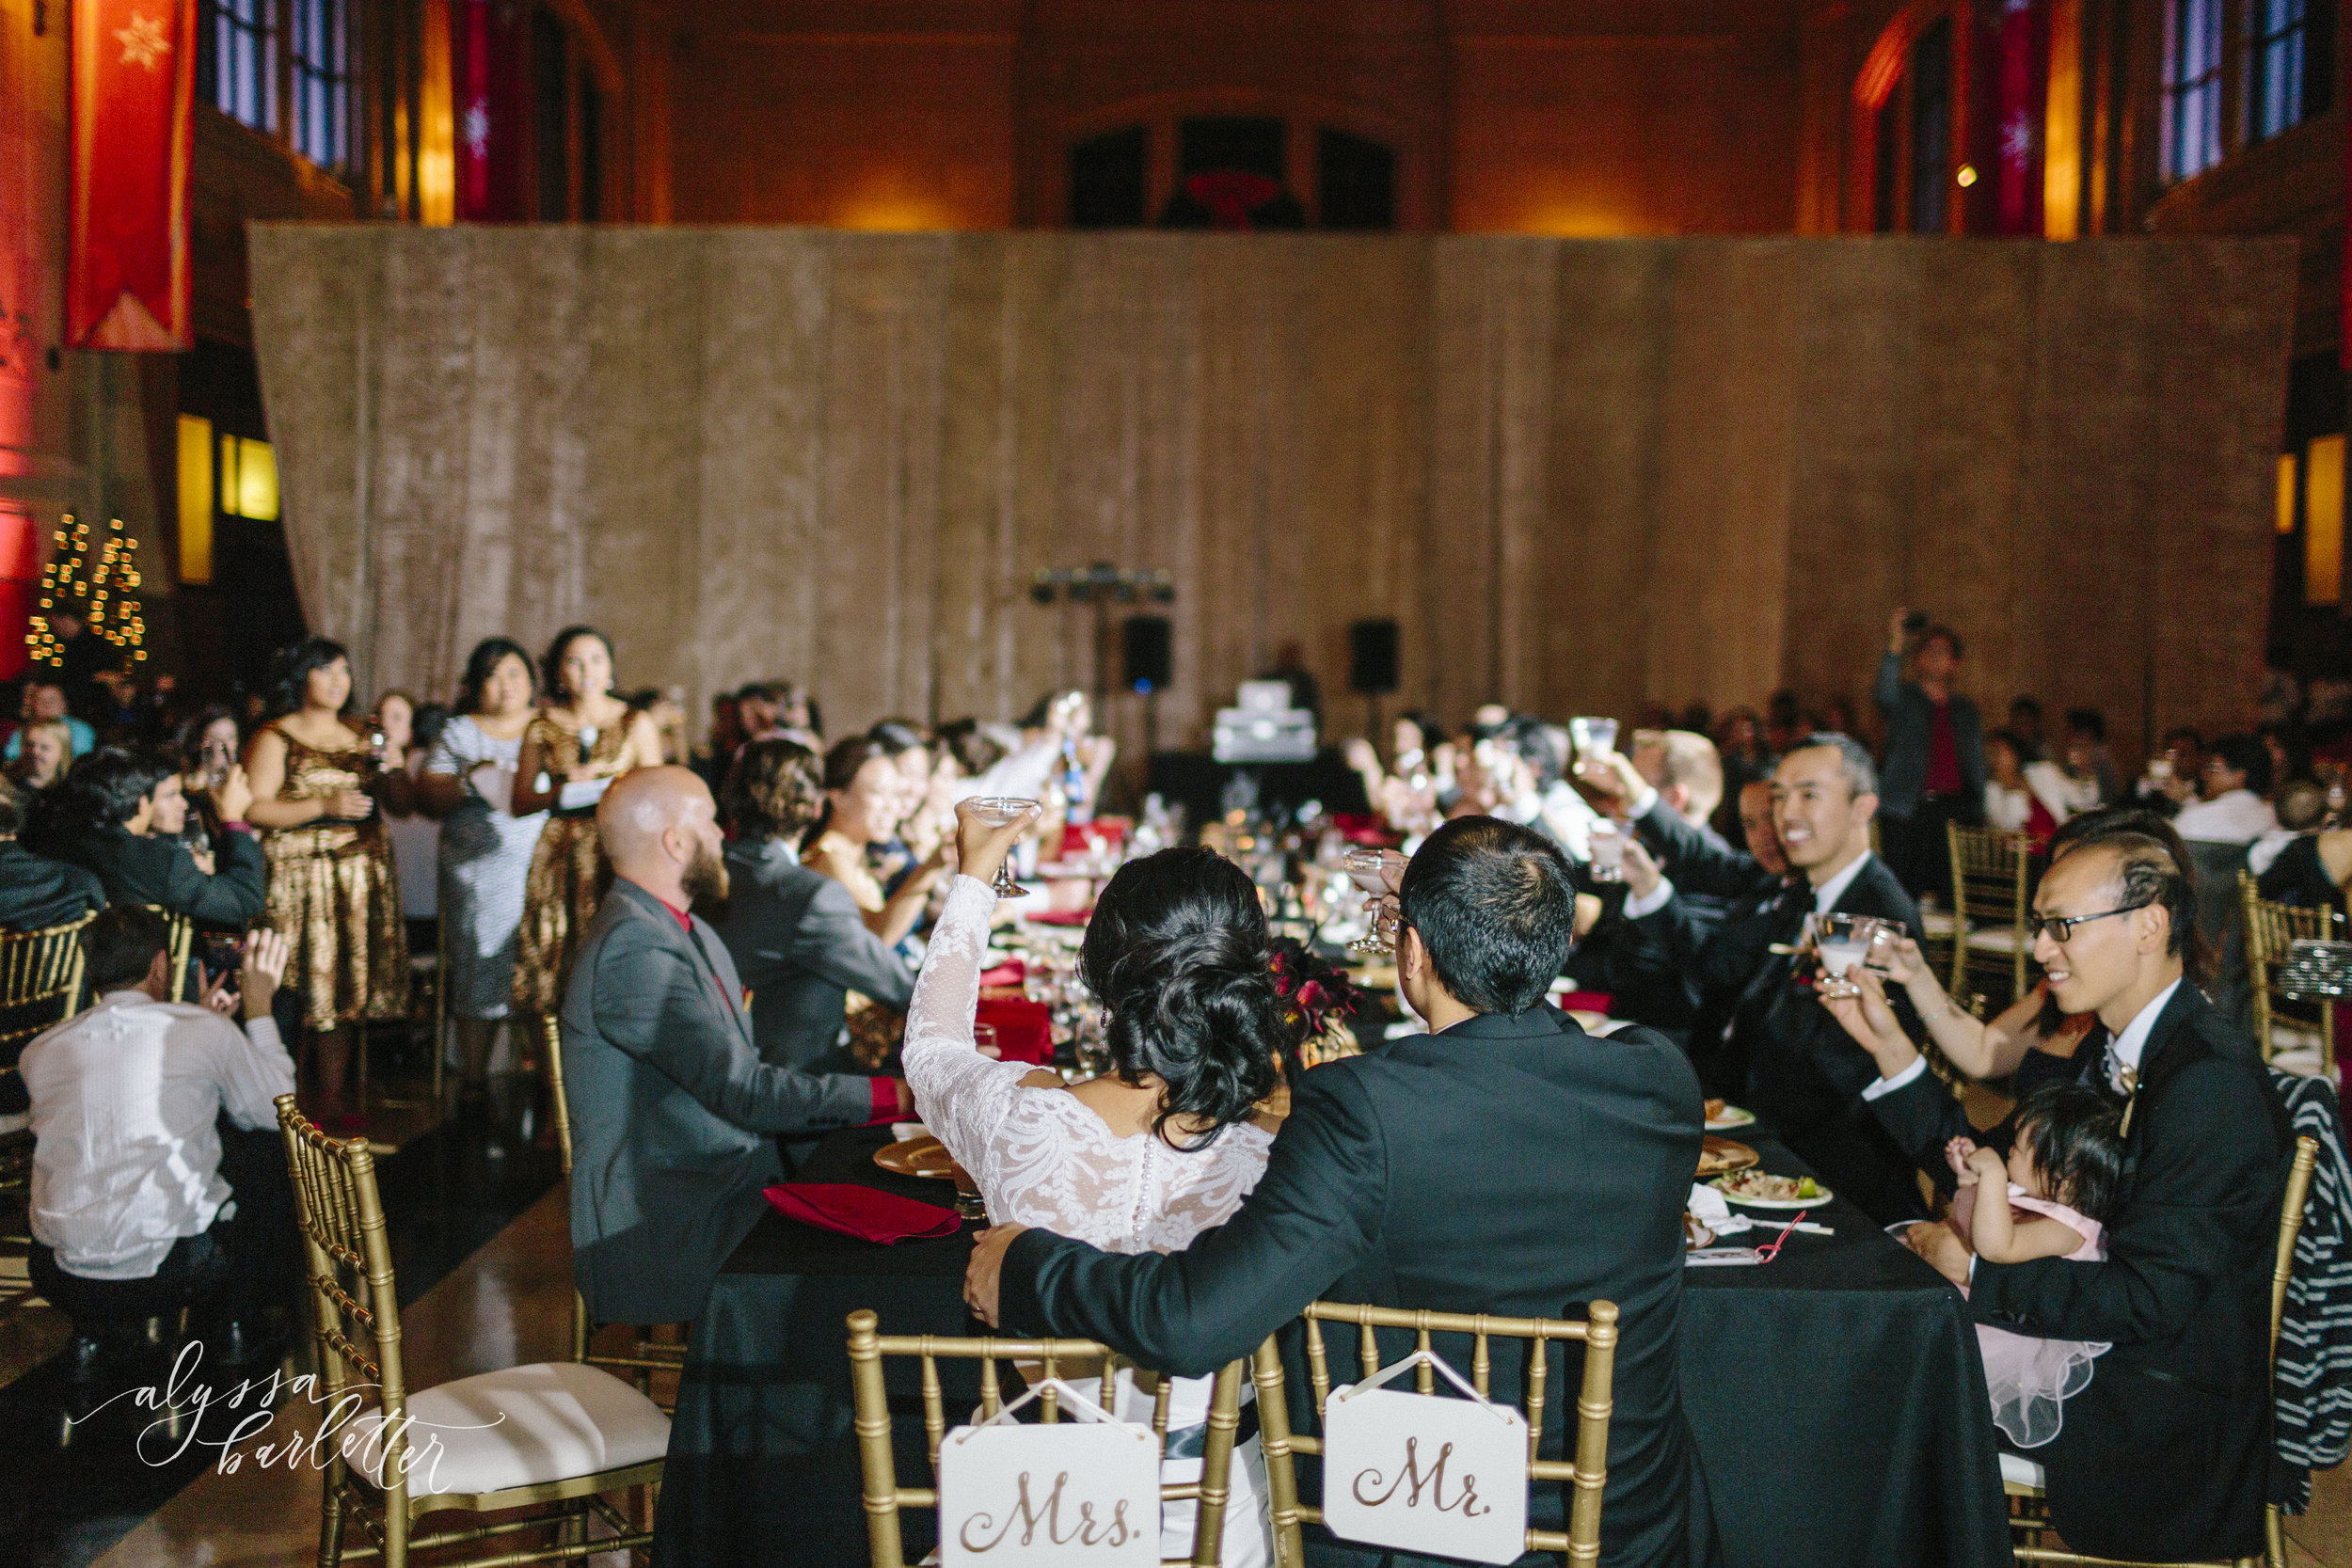 alyssa barletter photography union station wedding photos leopard print winter wedding-1-50.jpg